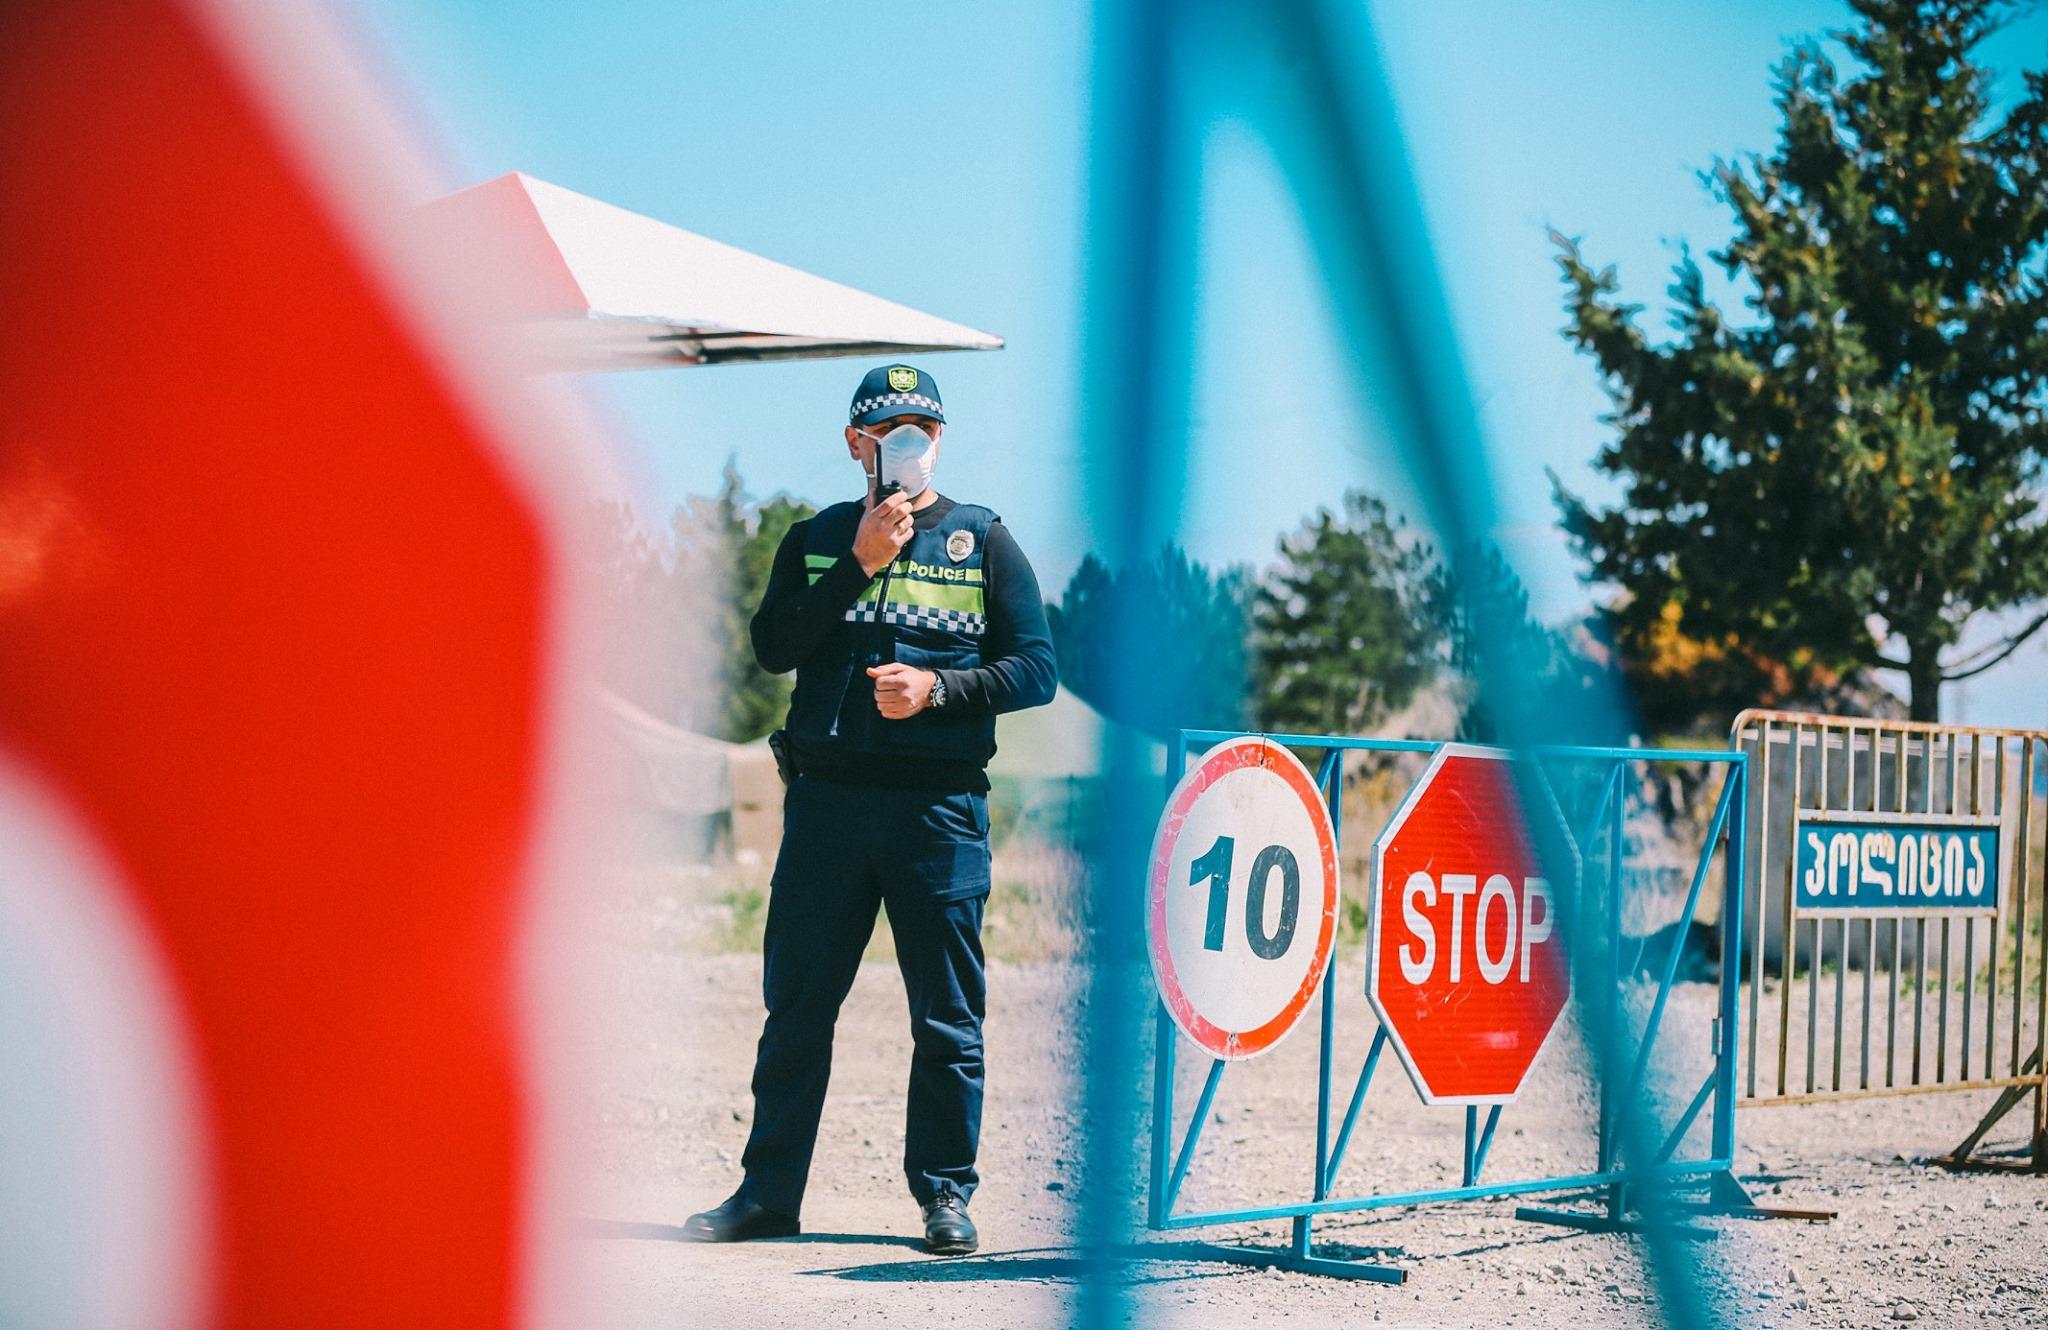 COVID Police 2 #новости коронавирус, коронавирус в Грузии, Тетрицкаро, Шота Рехвиашвили